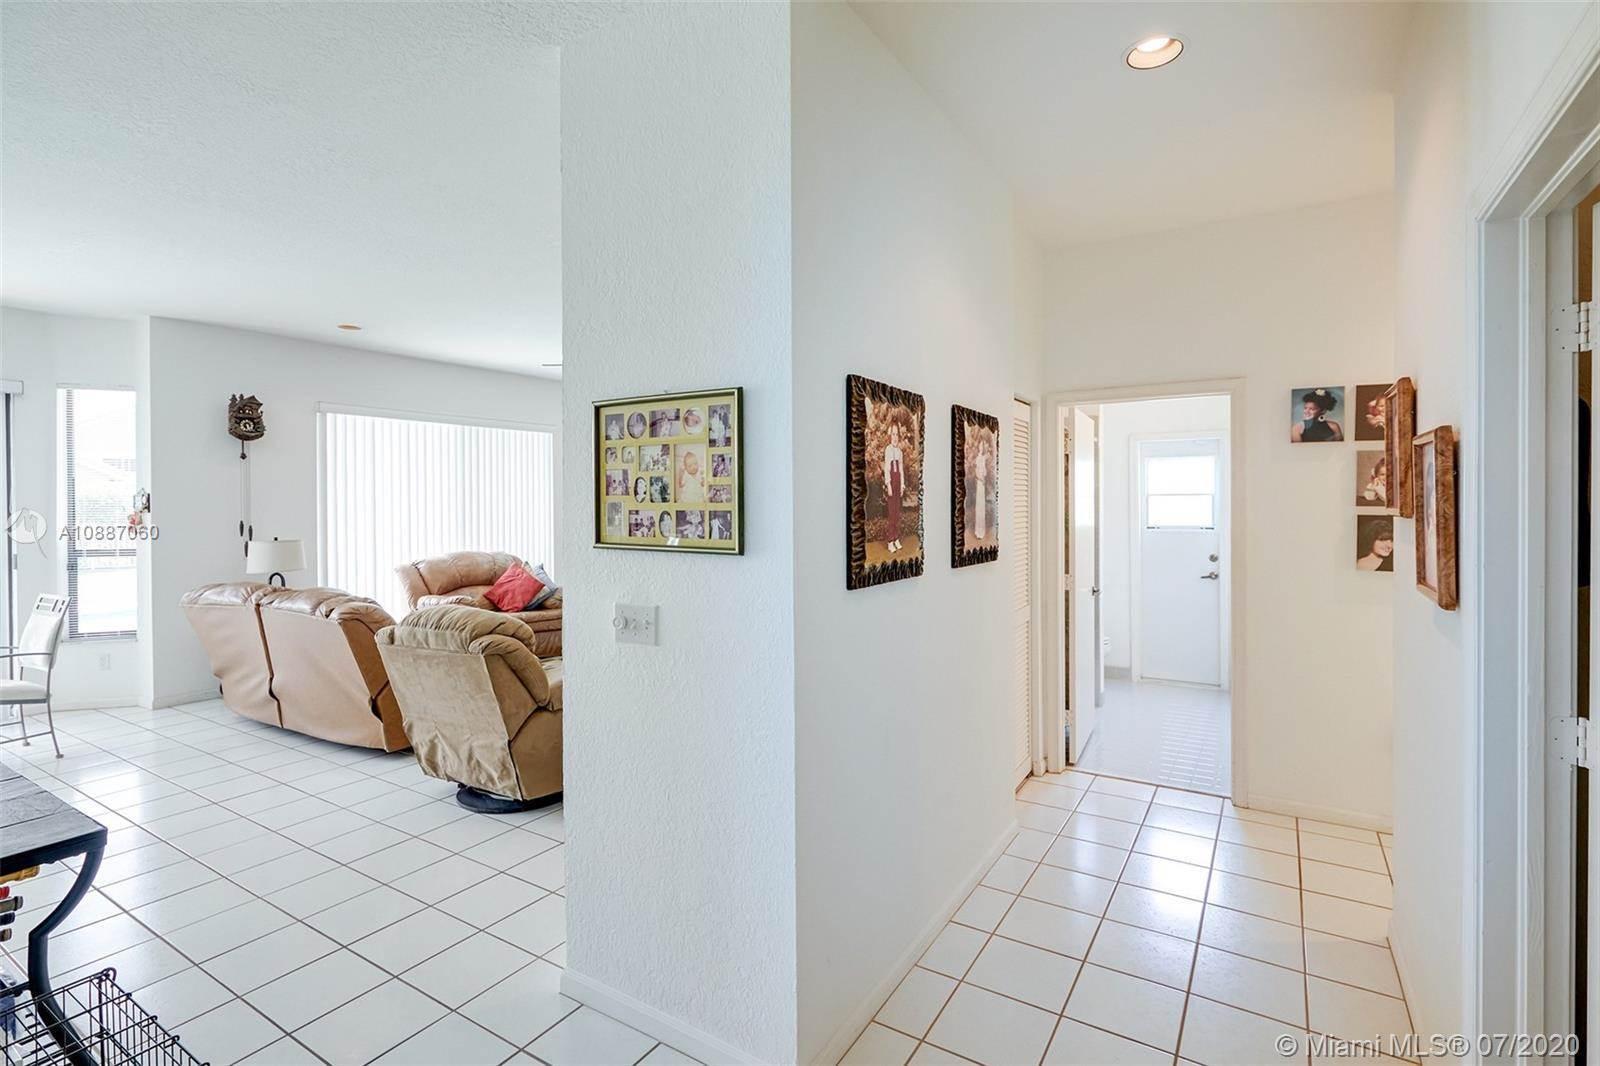 601 West Cypress Pointe Dr W, Pembroke Pines, FL 33027